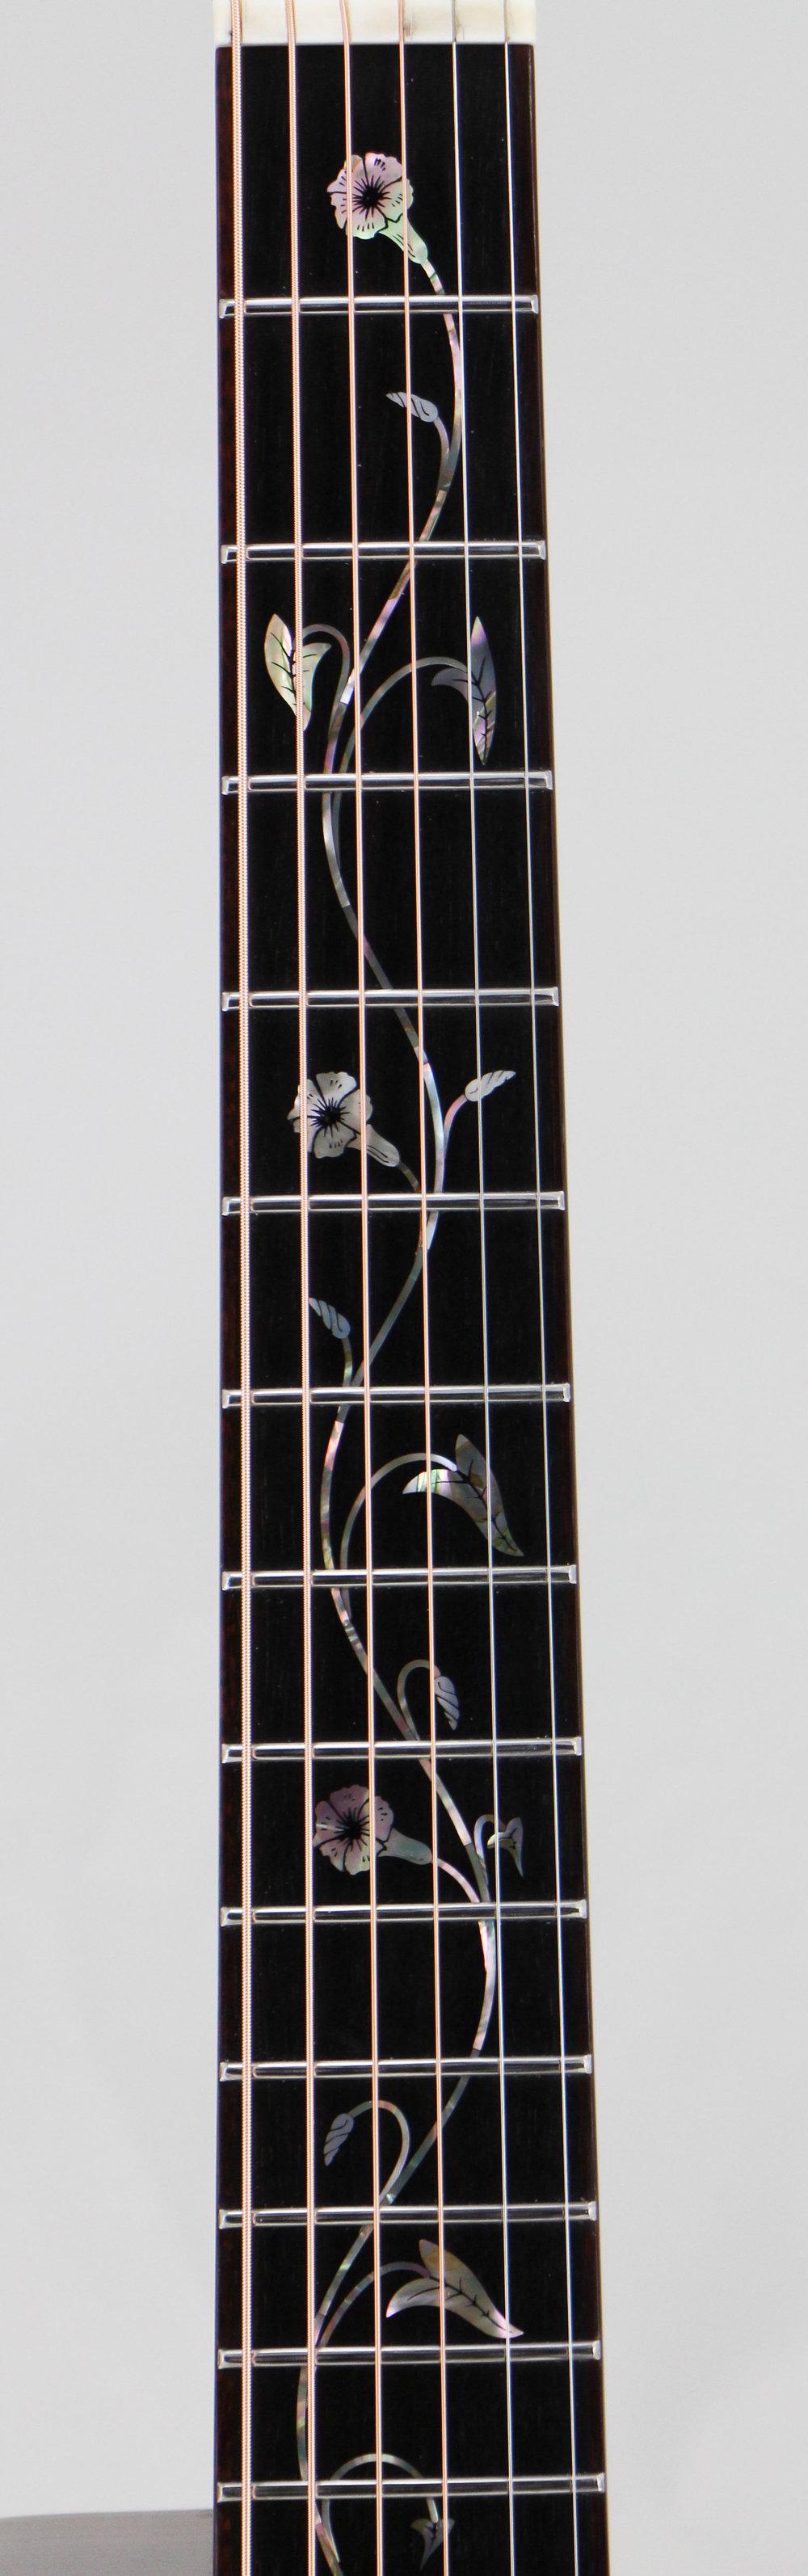 vinerhap-9.JPG